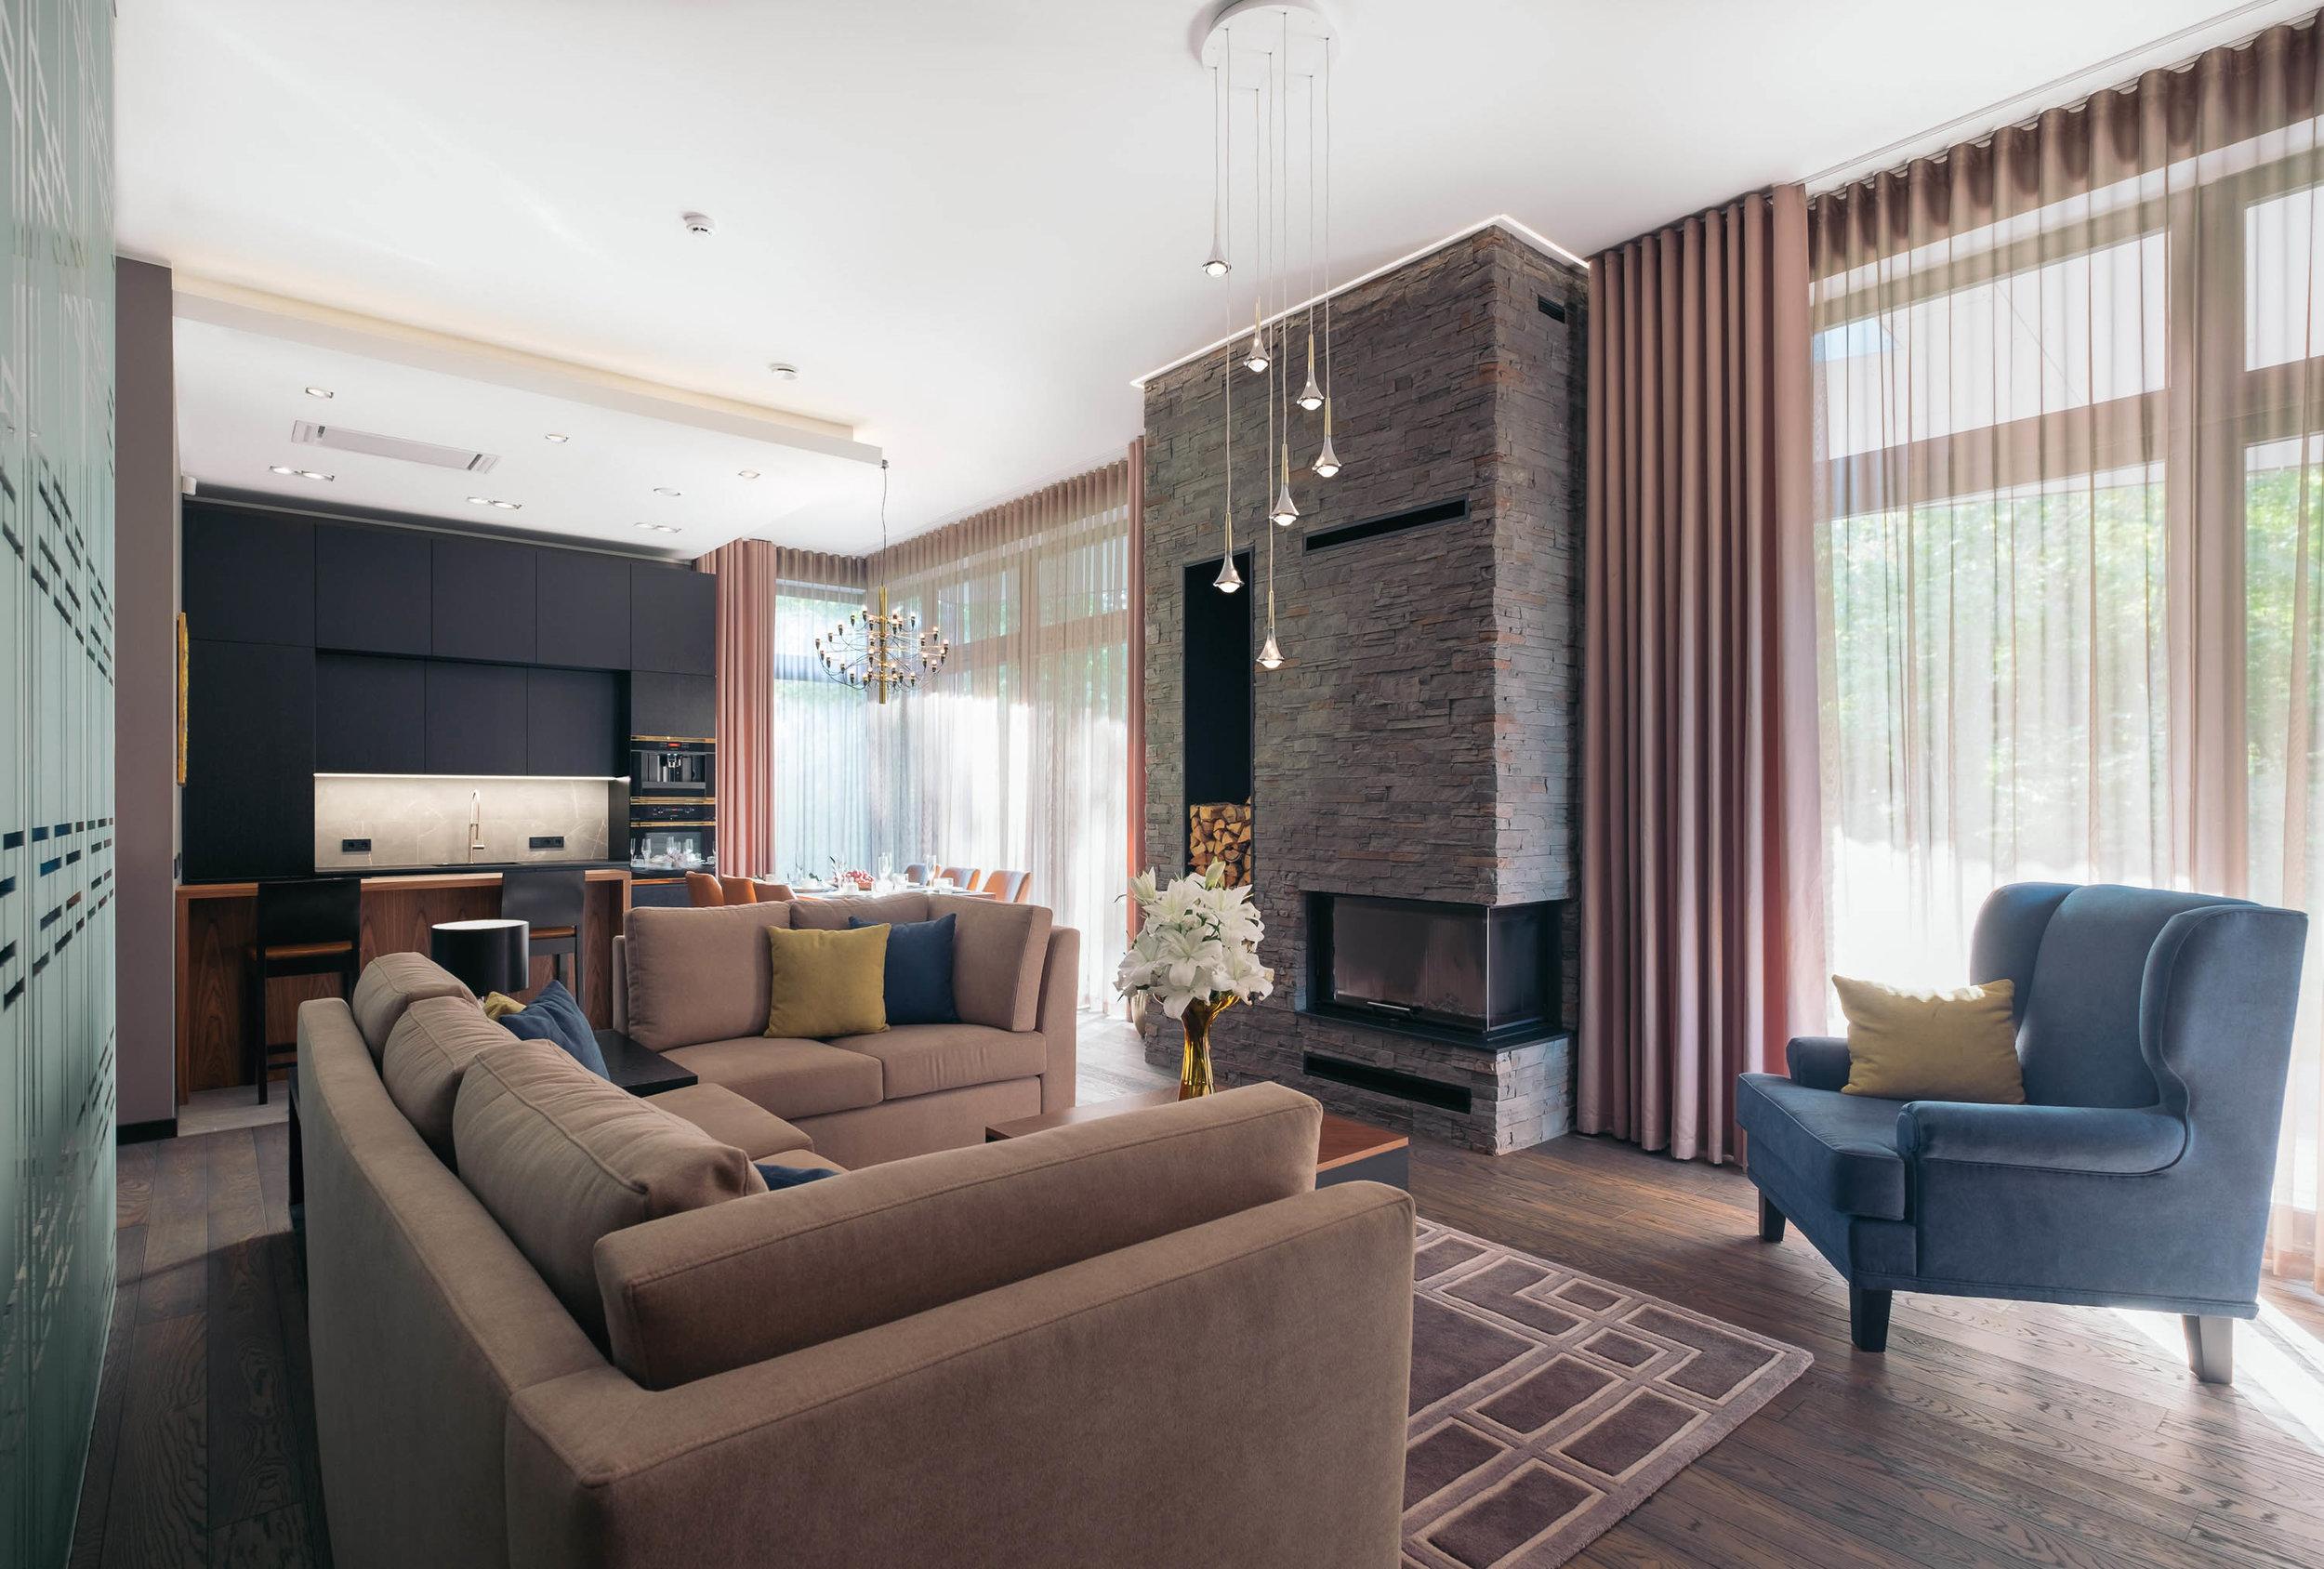 Interior design by VB Design